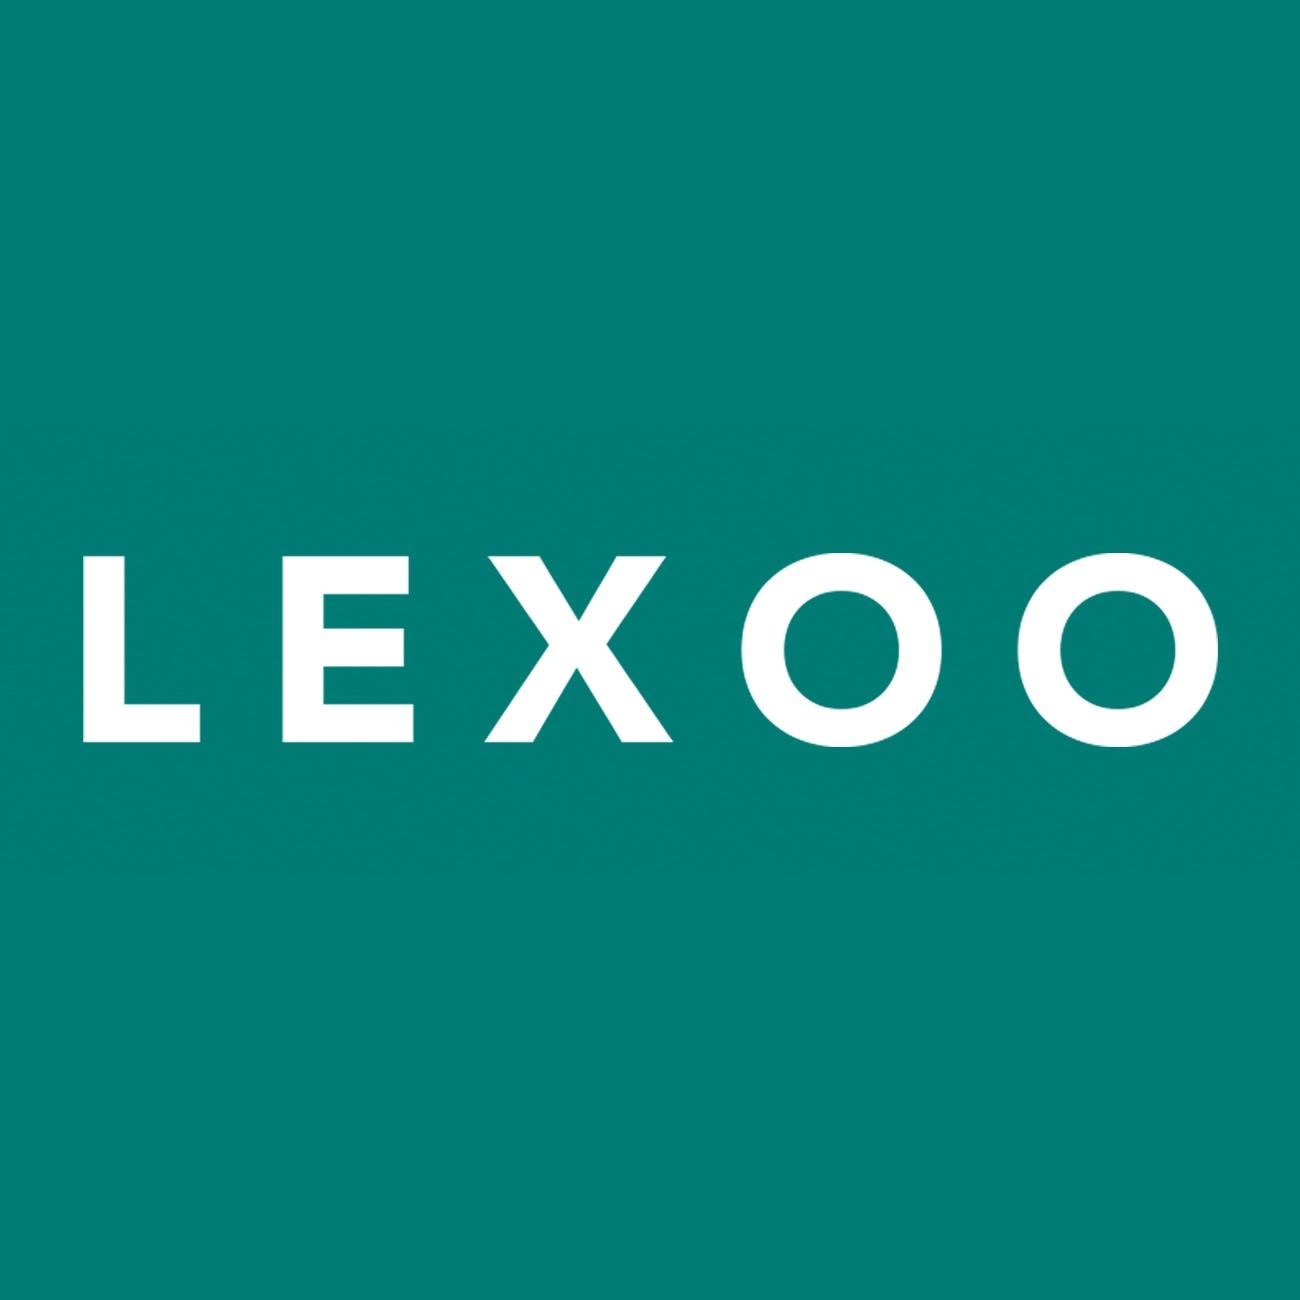 Lexoo square green